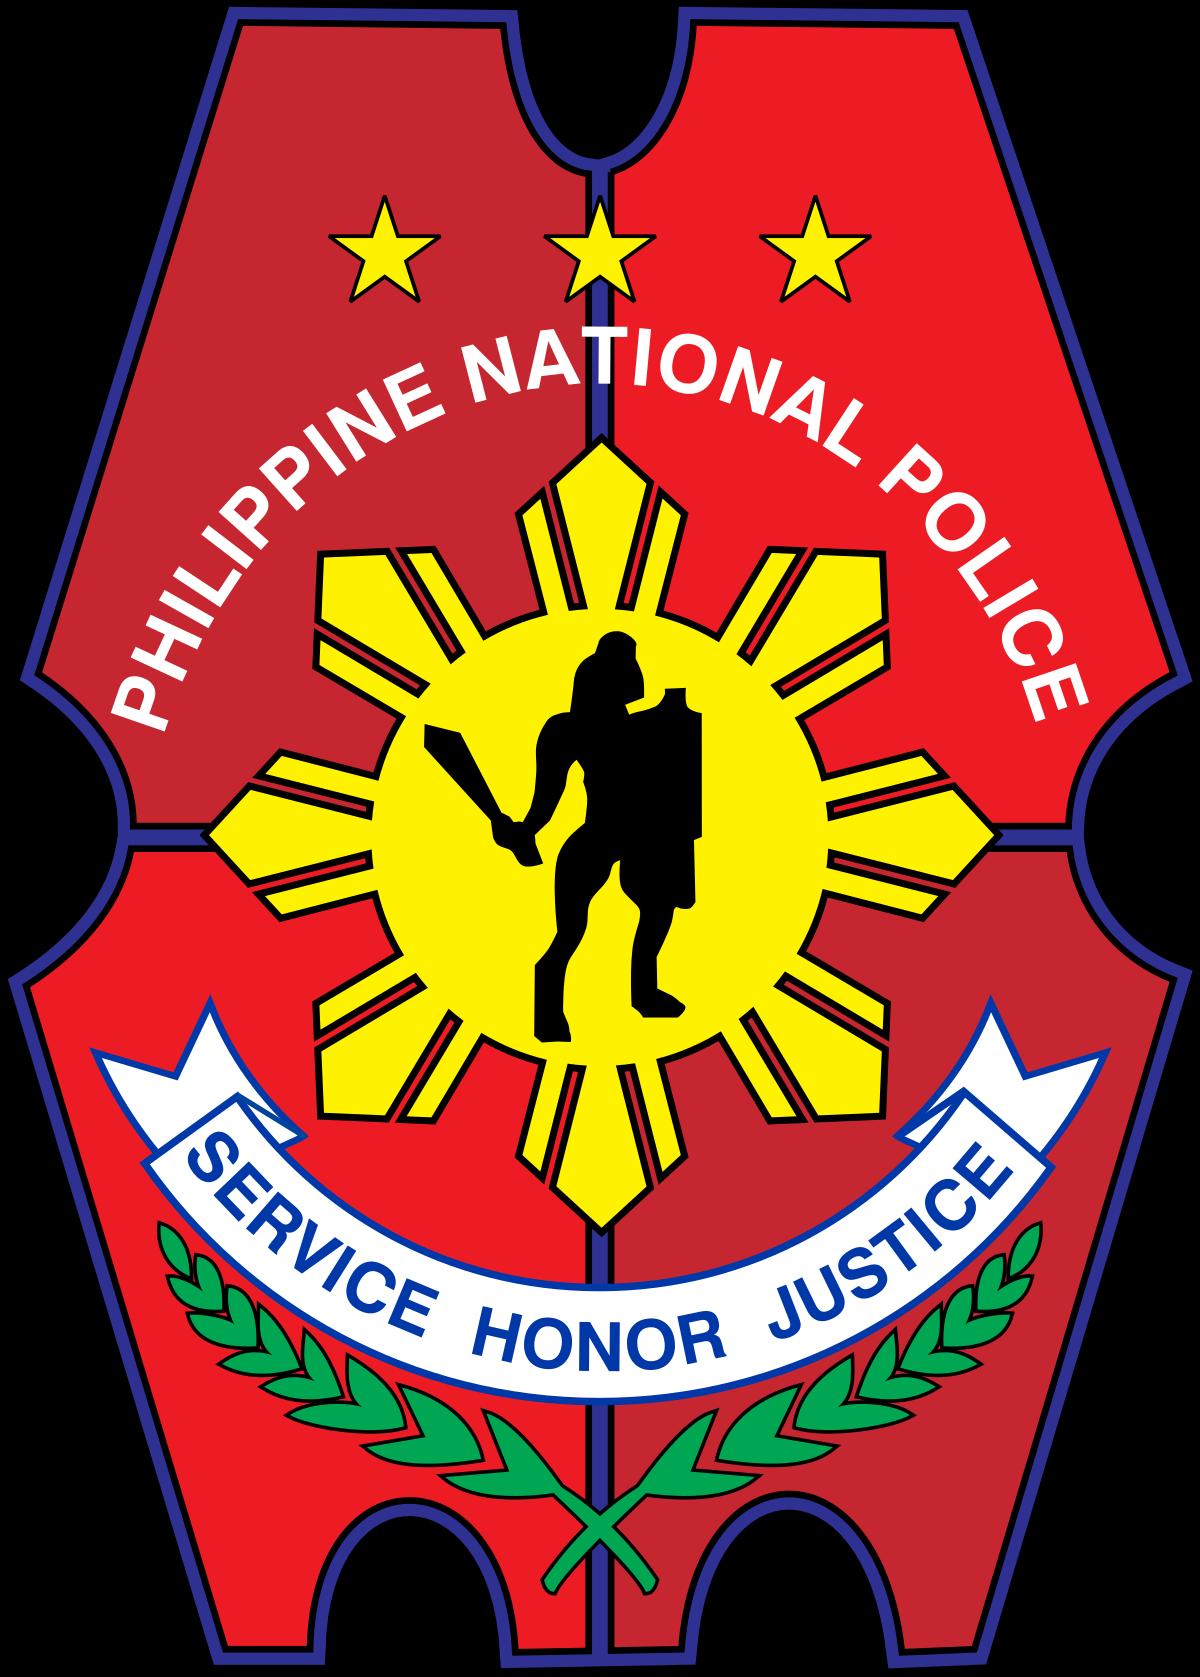 Phillipines clipart civil right #10